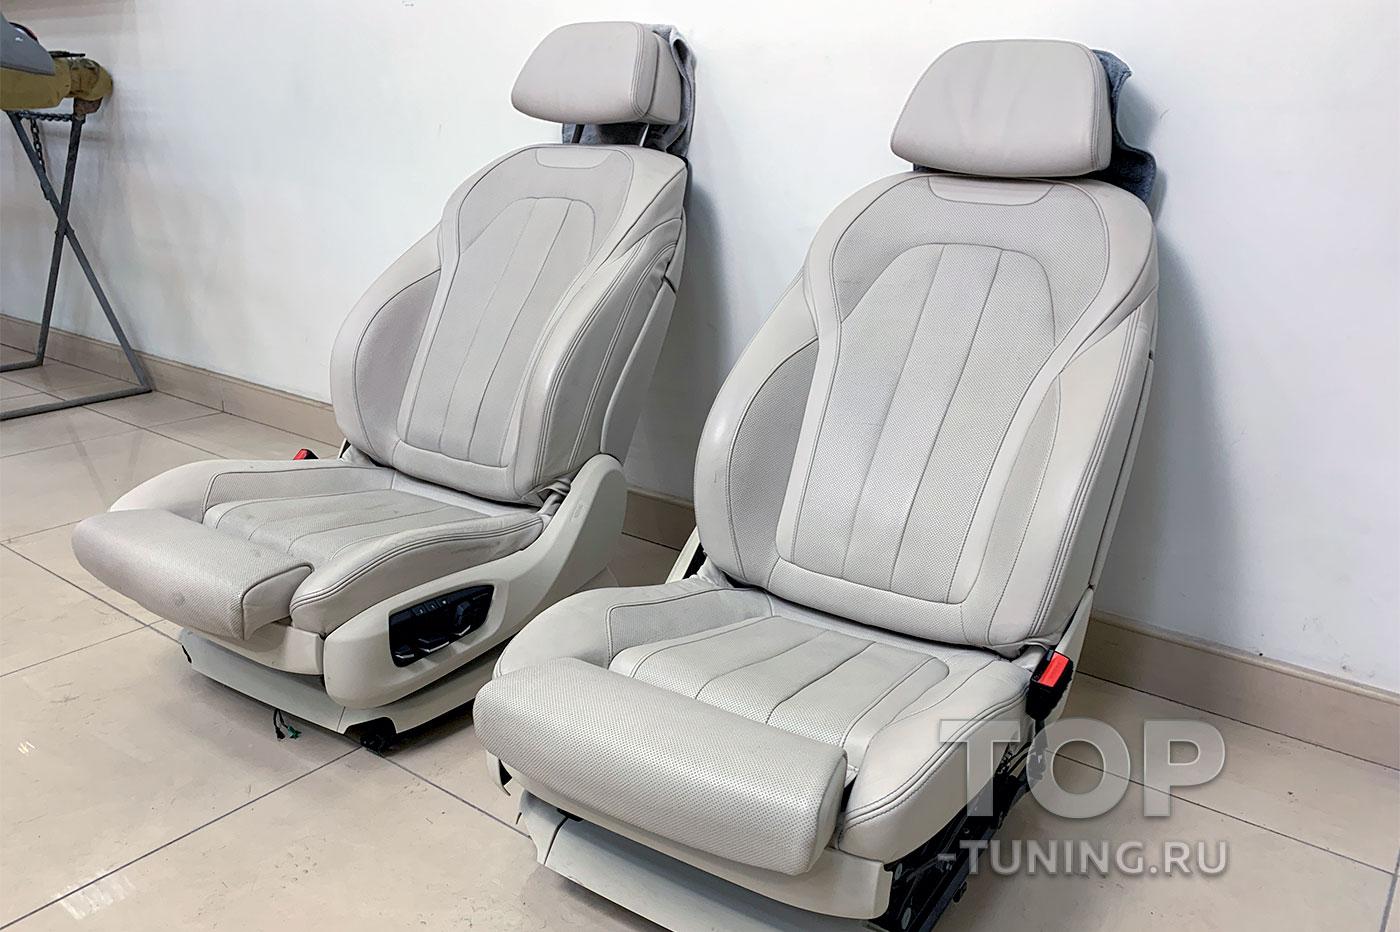 Восстановление кожи на сидениях водителя и пассажира